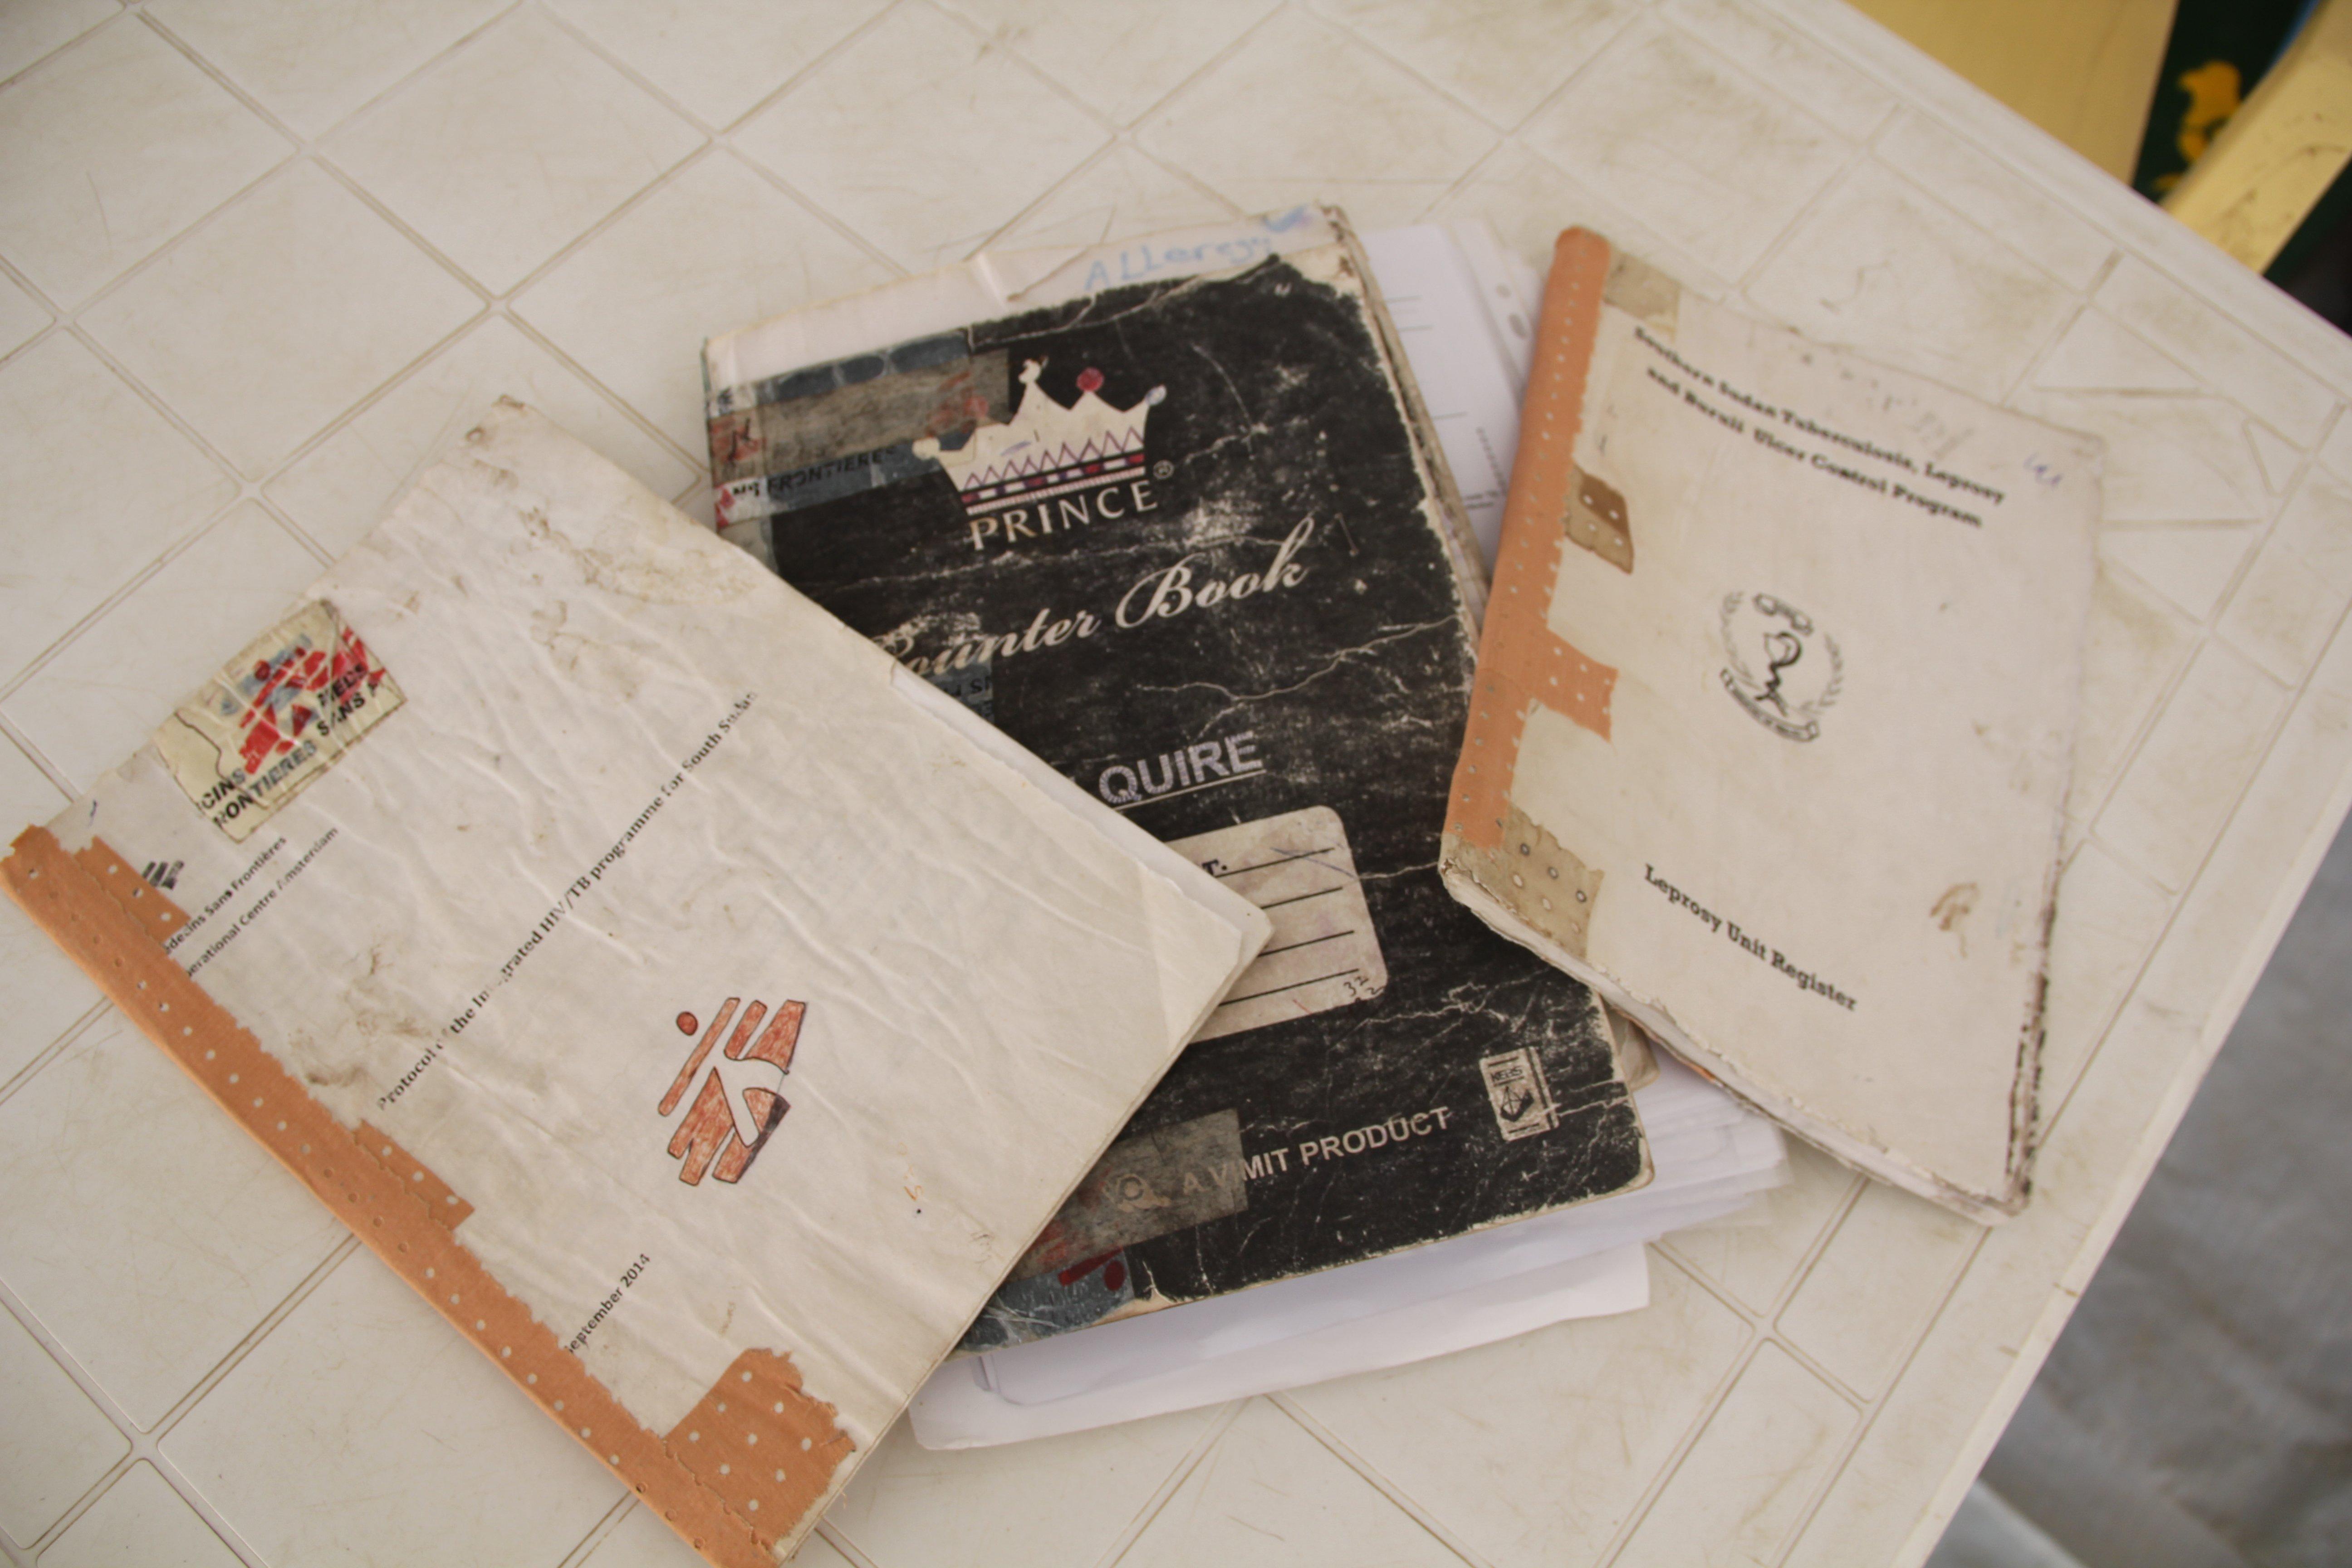 The book that traveled too far. Photo: Jacob Kuehn/MSF